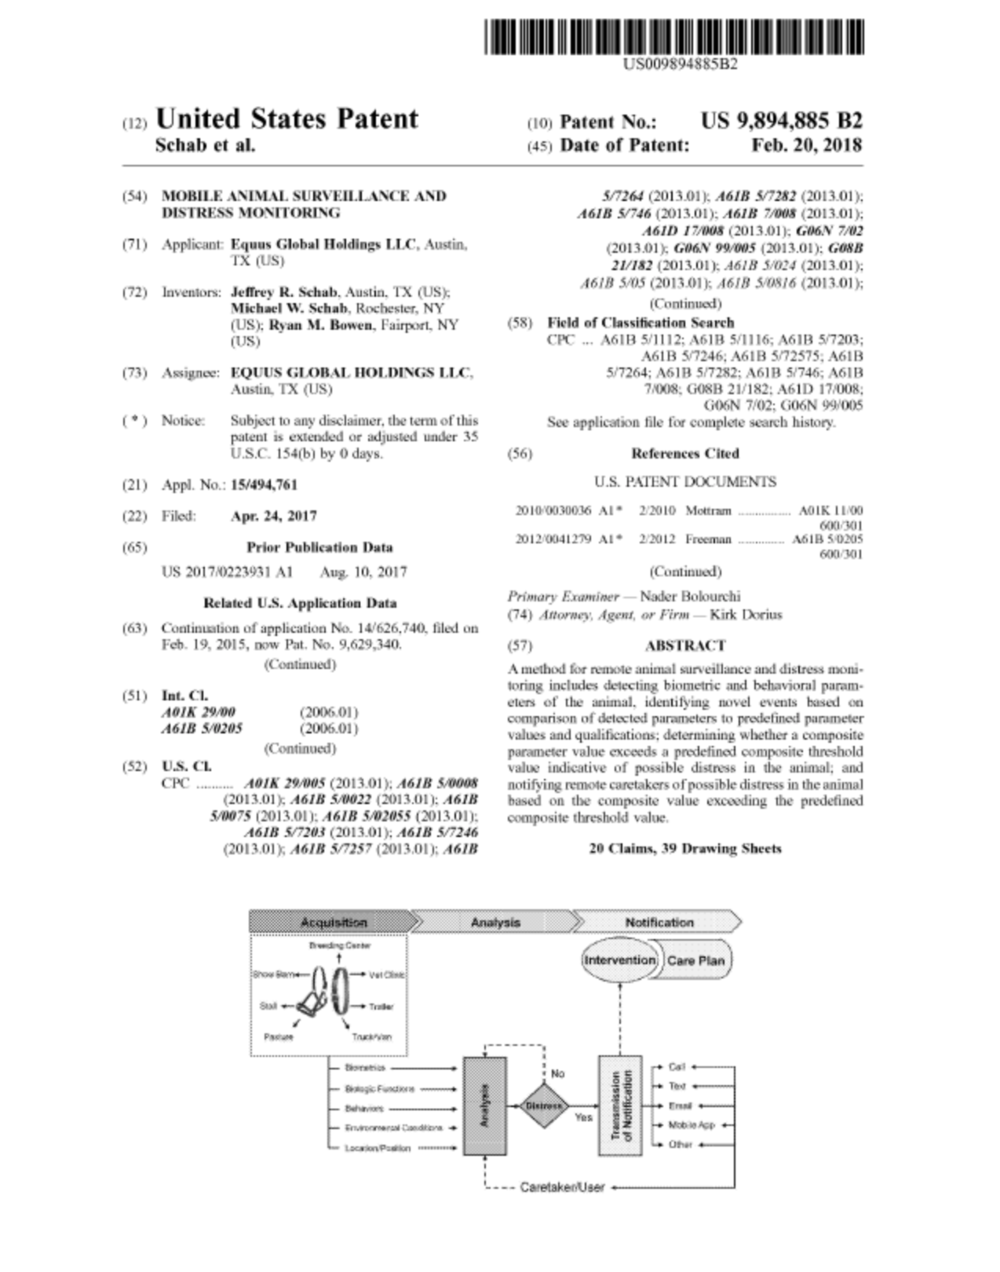 US patent no. 9,894,885